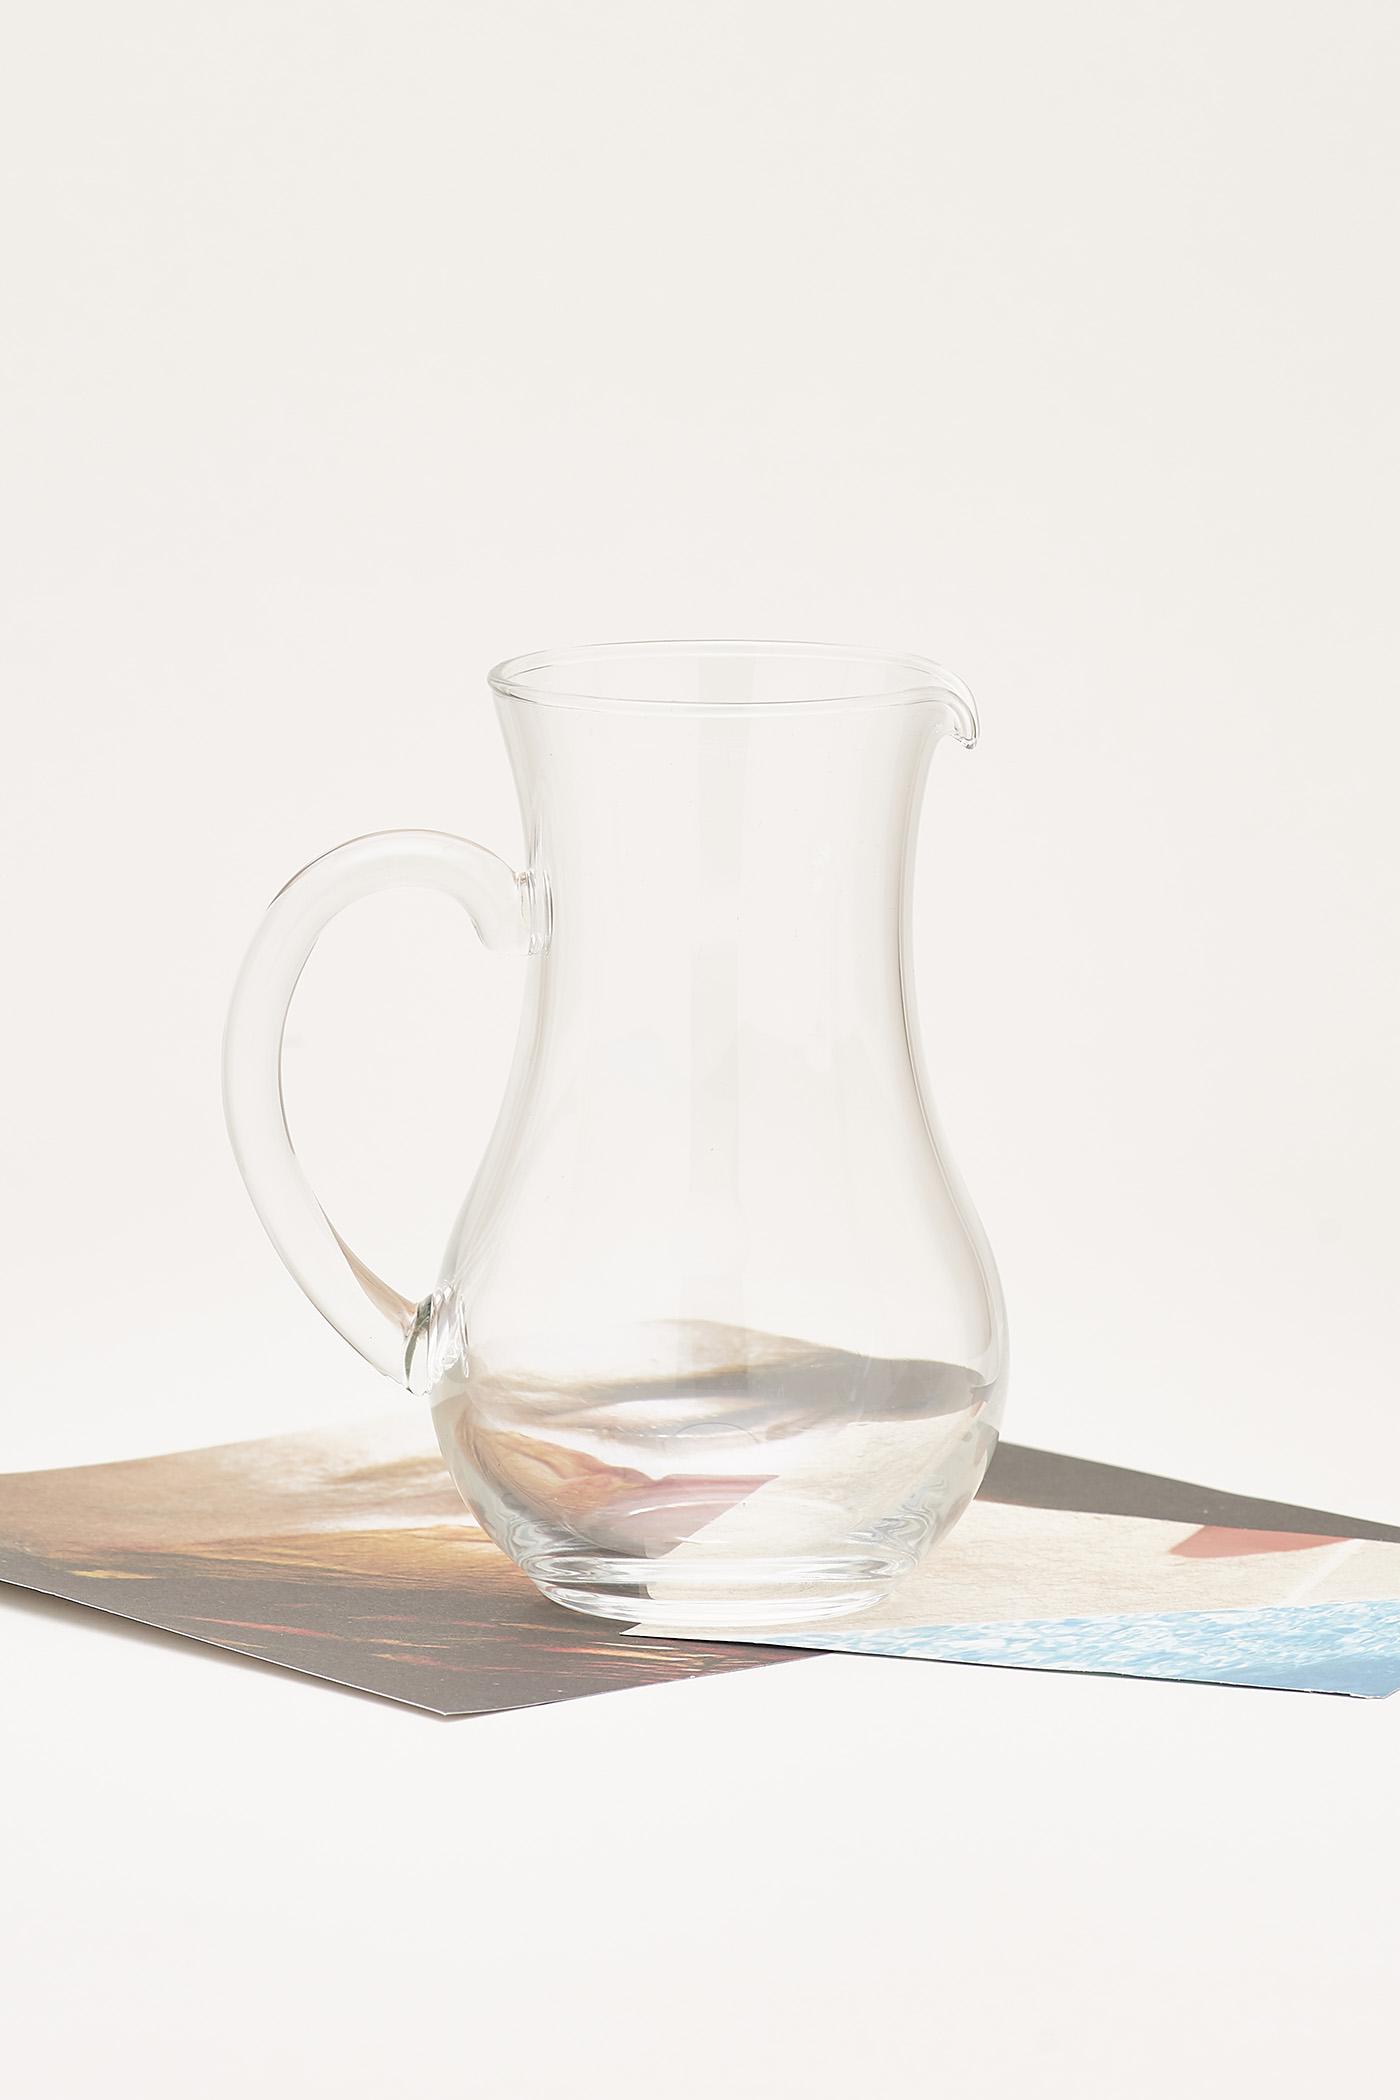 Araldo Glass Pitcher